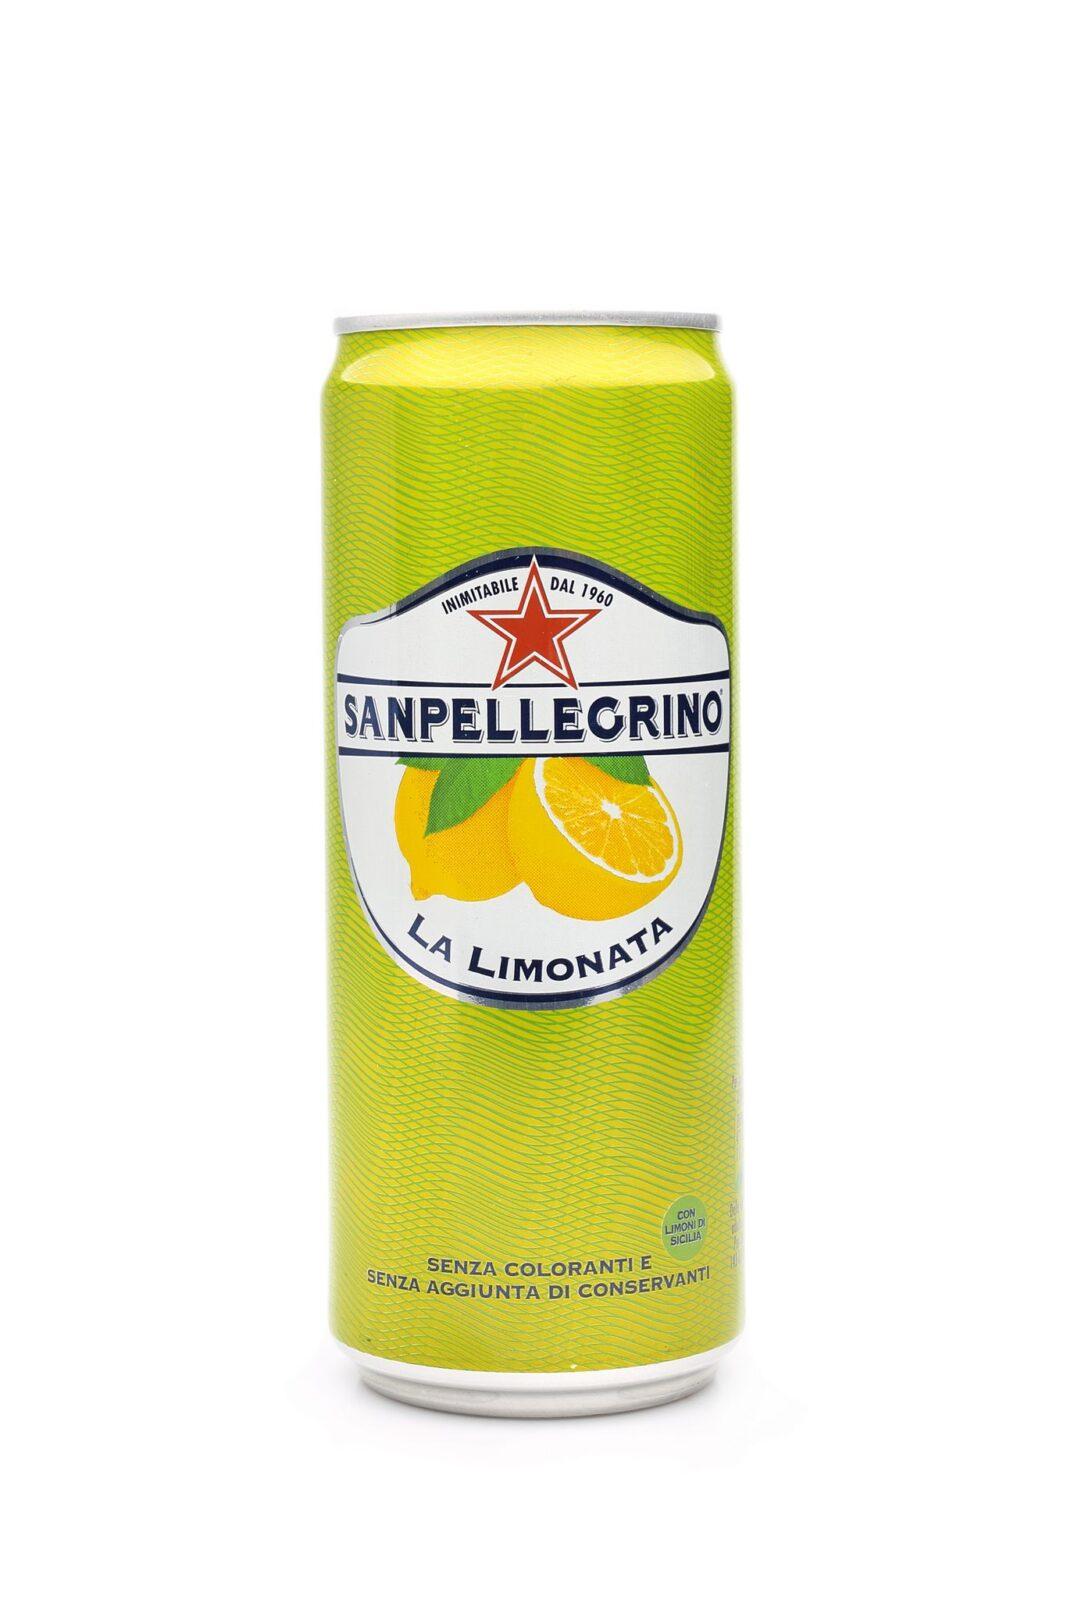 SANPELLEGRINO LA LIMONATA GLUTEN FREE 330 ml